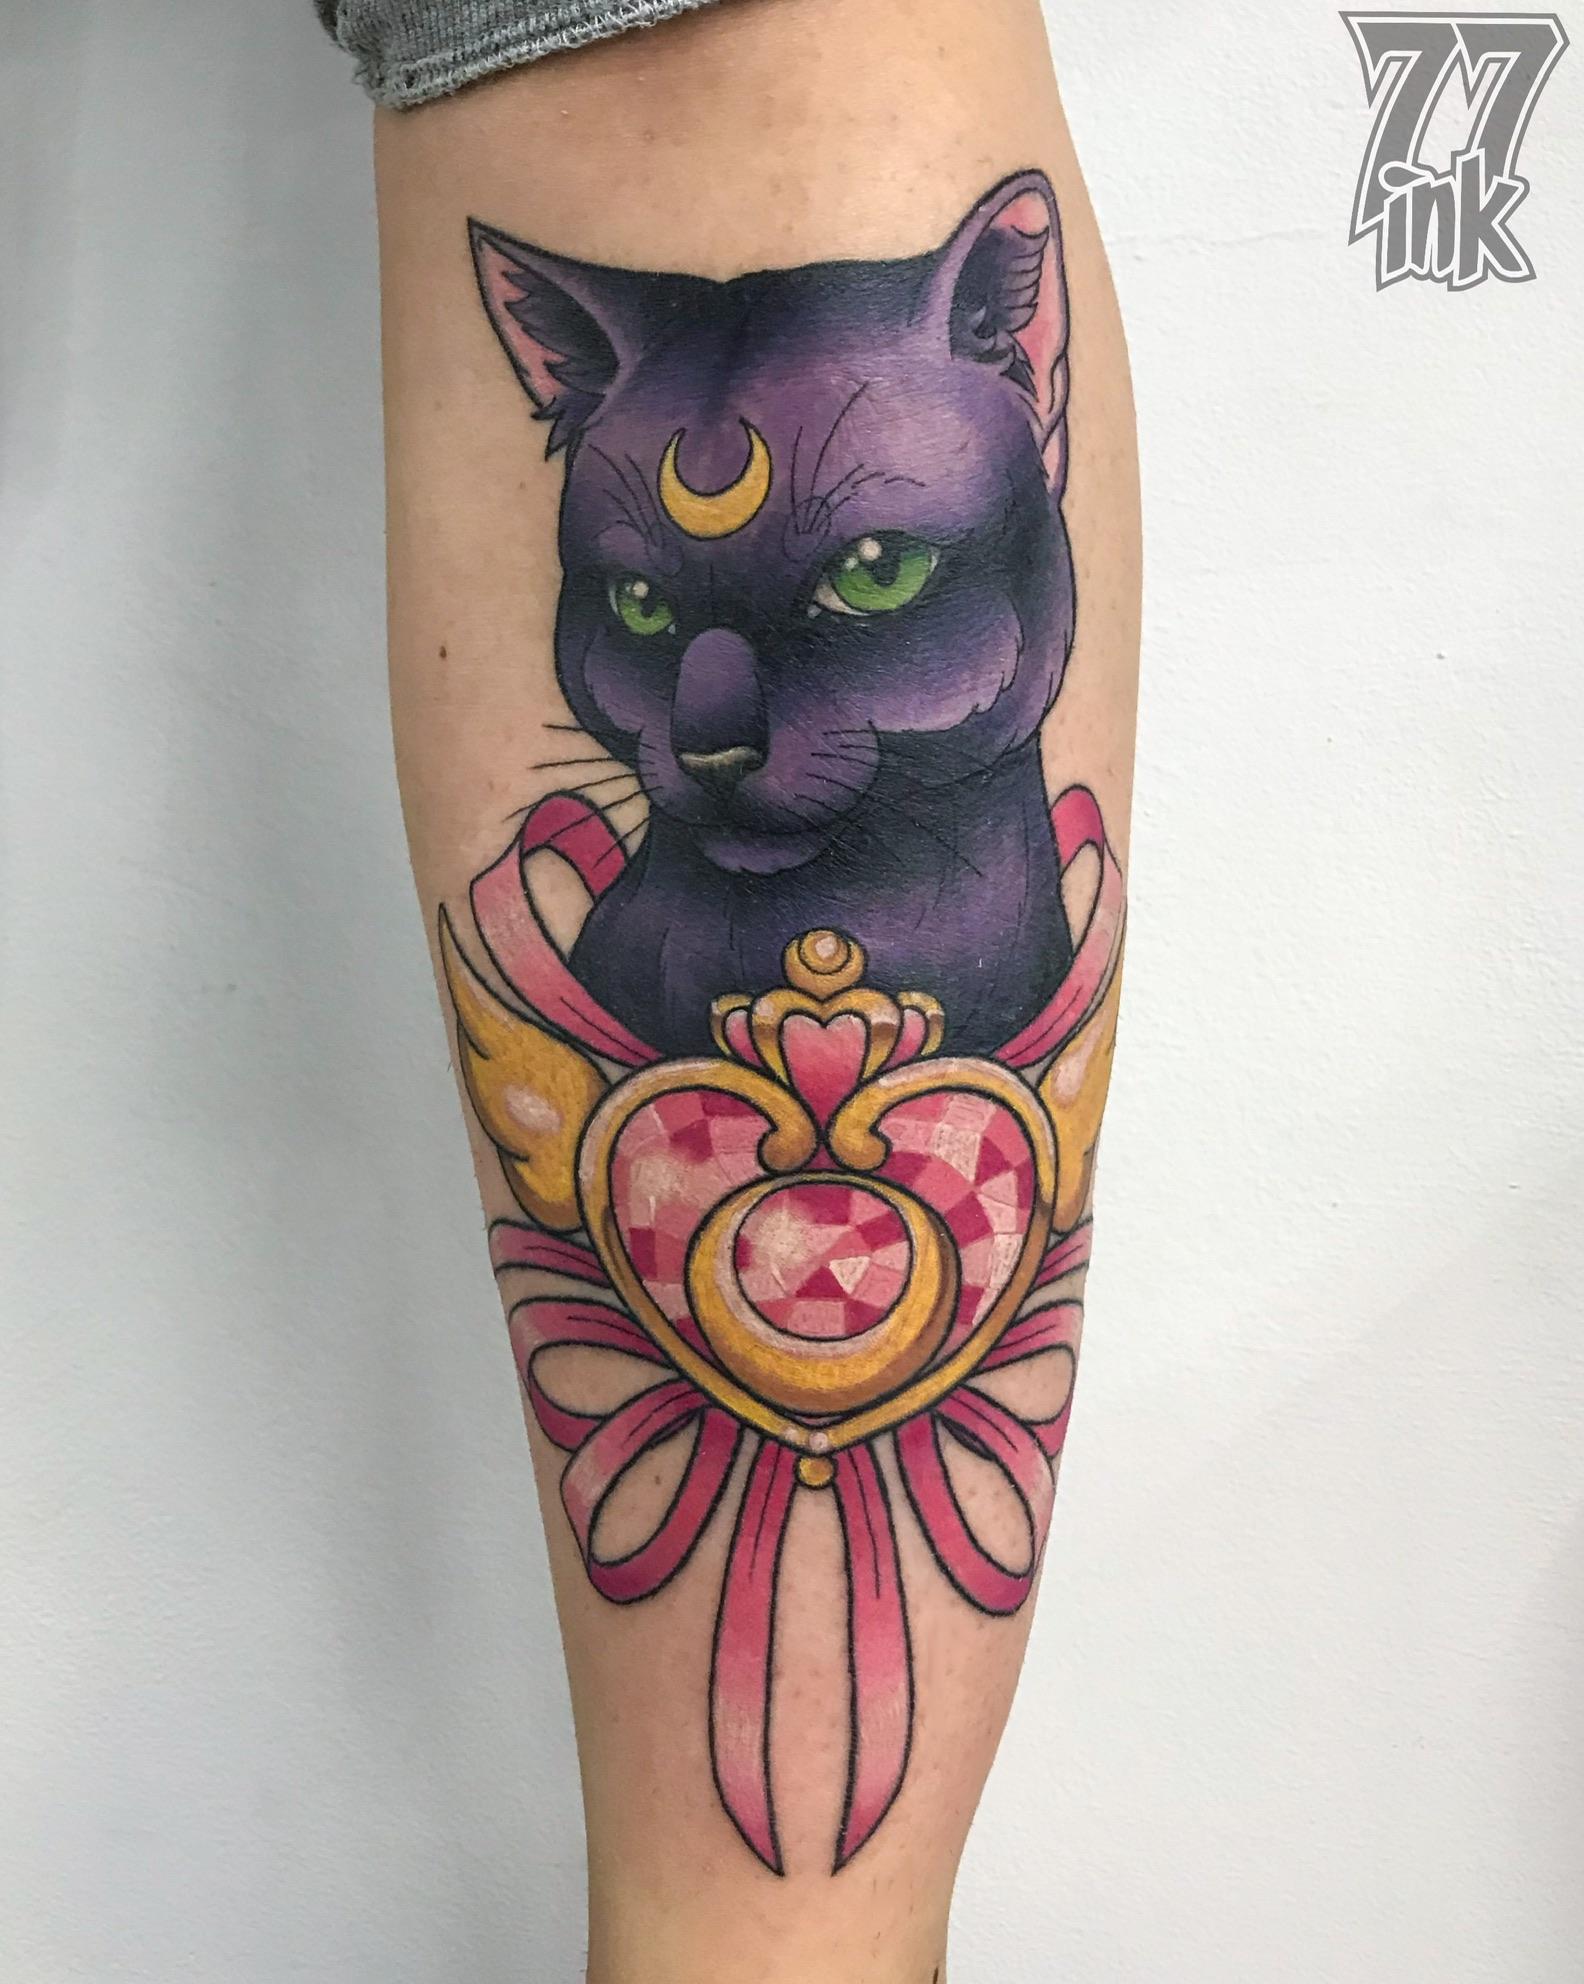 Iza Bagińska inksearch tattoo